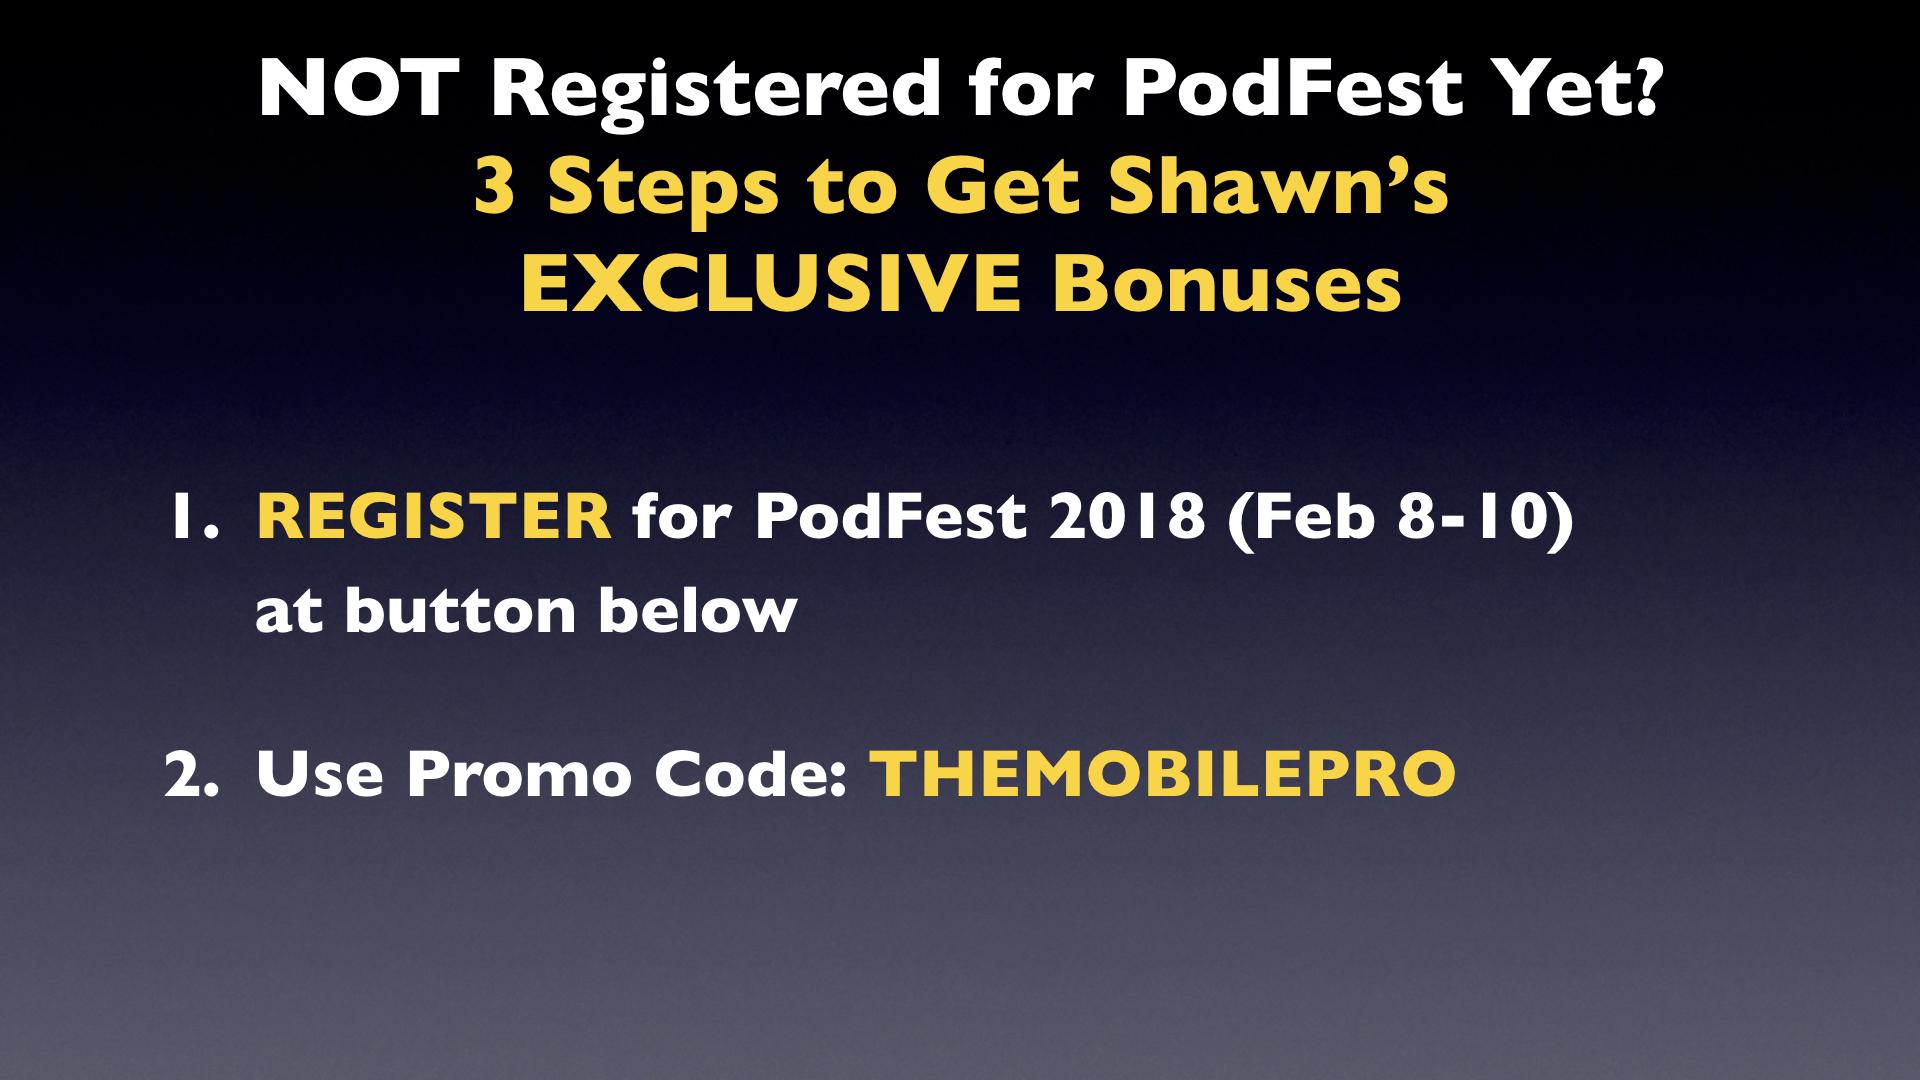 PodFest 18 Promo - PME - 2.002.jpeg